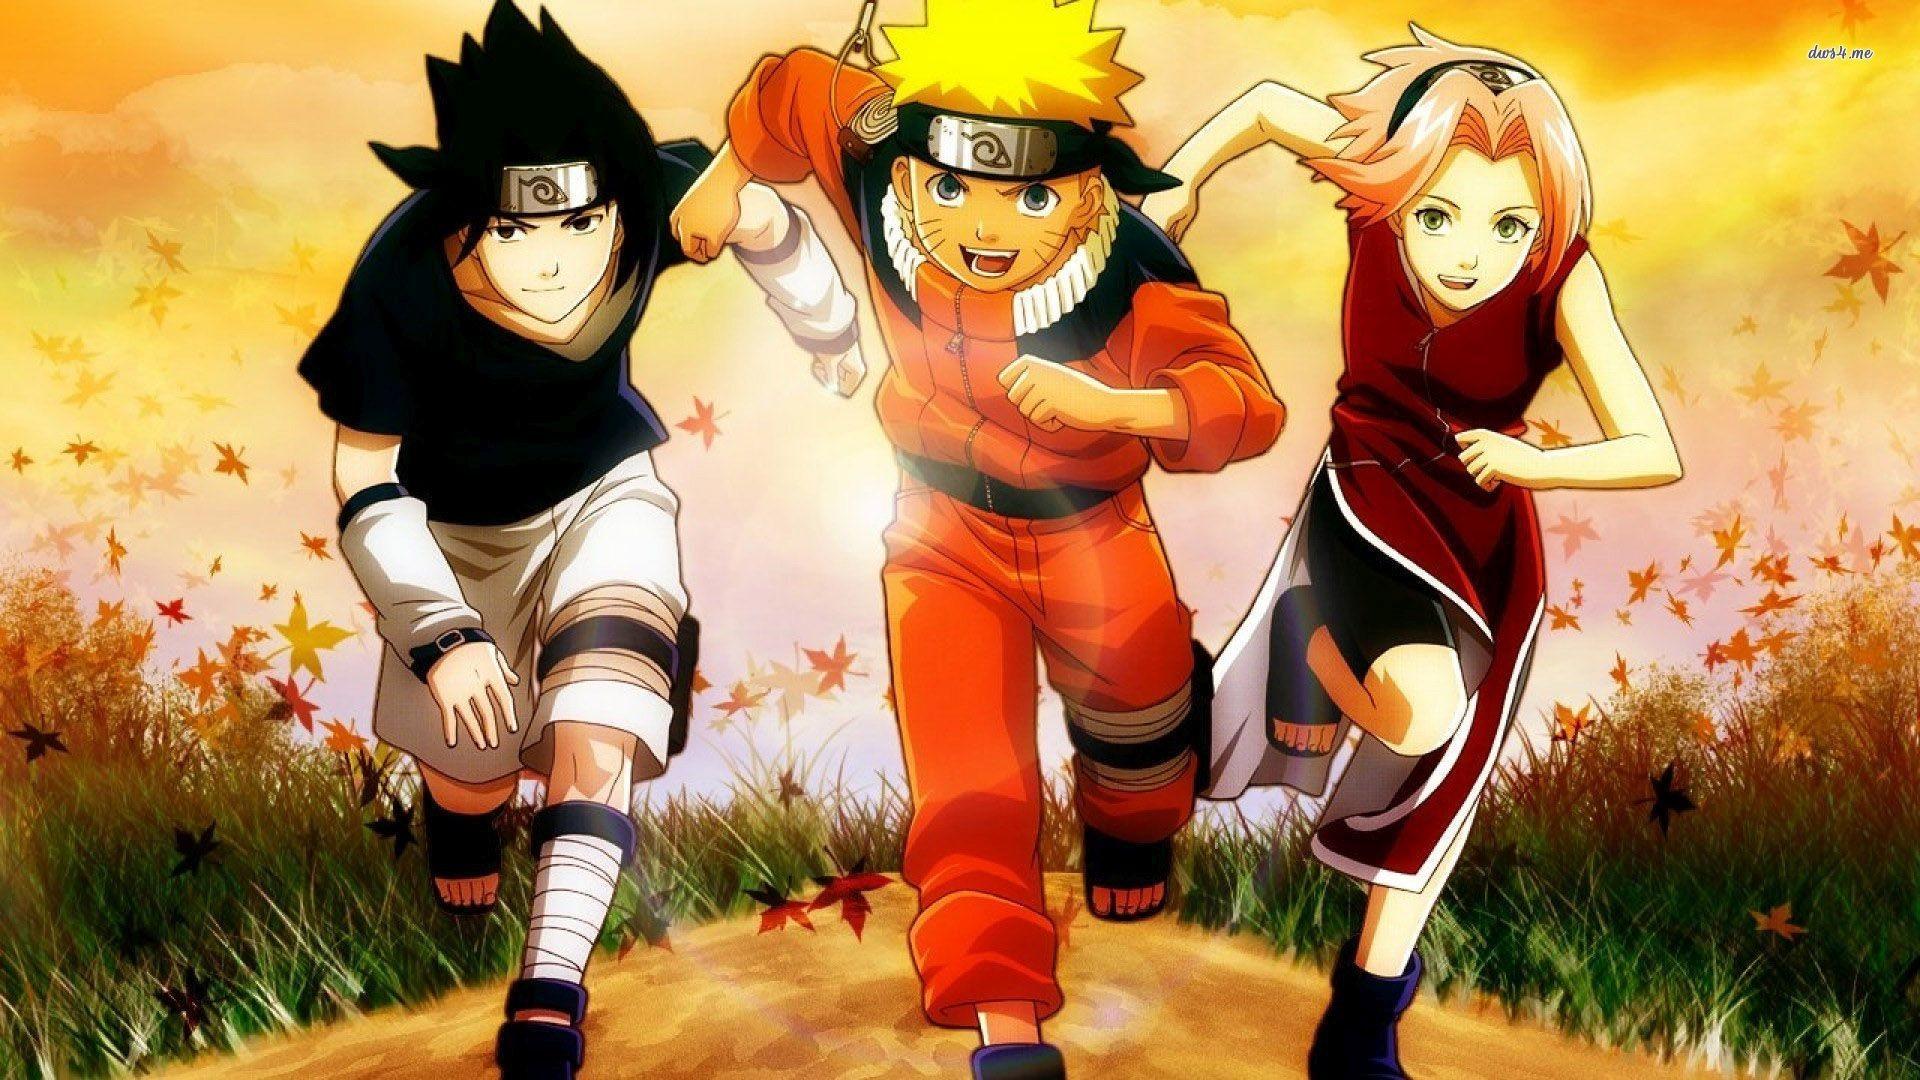 Res: 1920x1080, sakura naruto and sasuke anime wallpaper Naruto Wallpapers and Backgrounds  and download them on all your